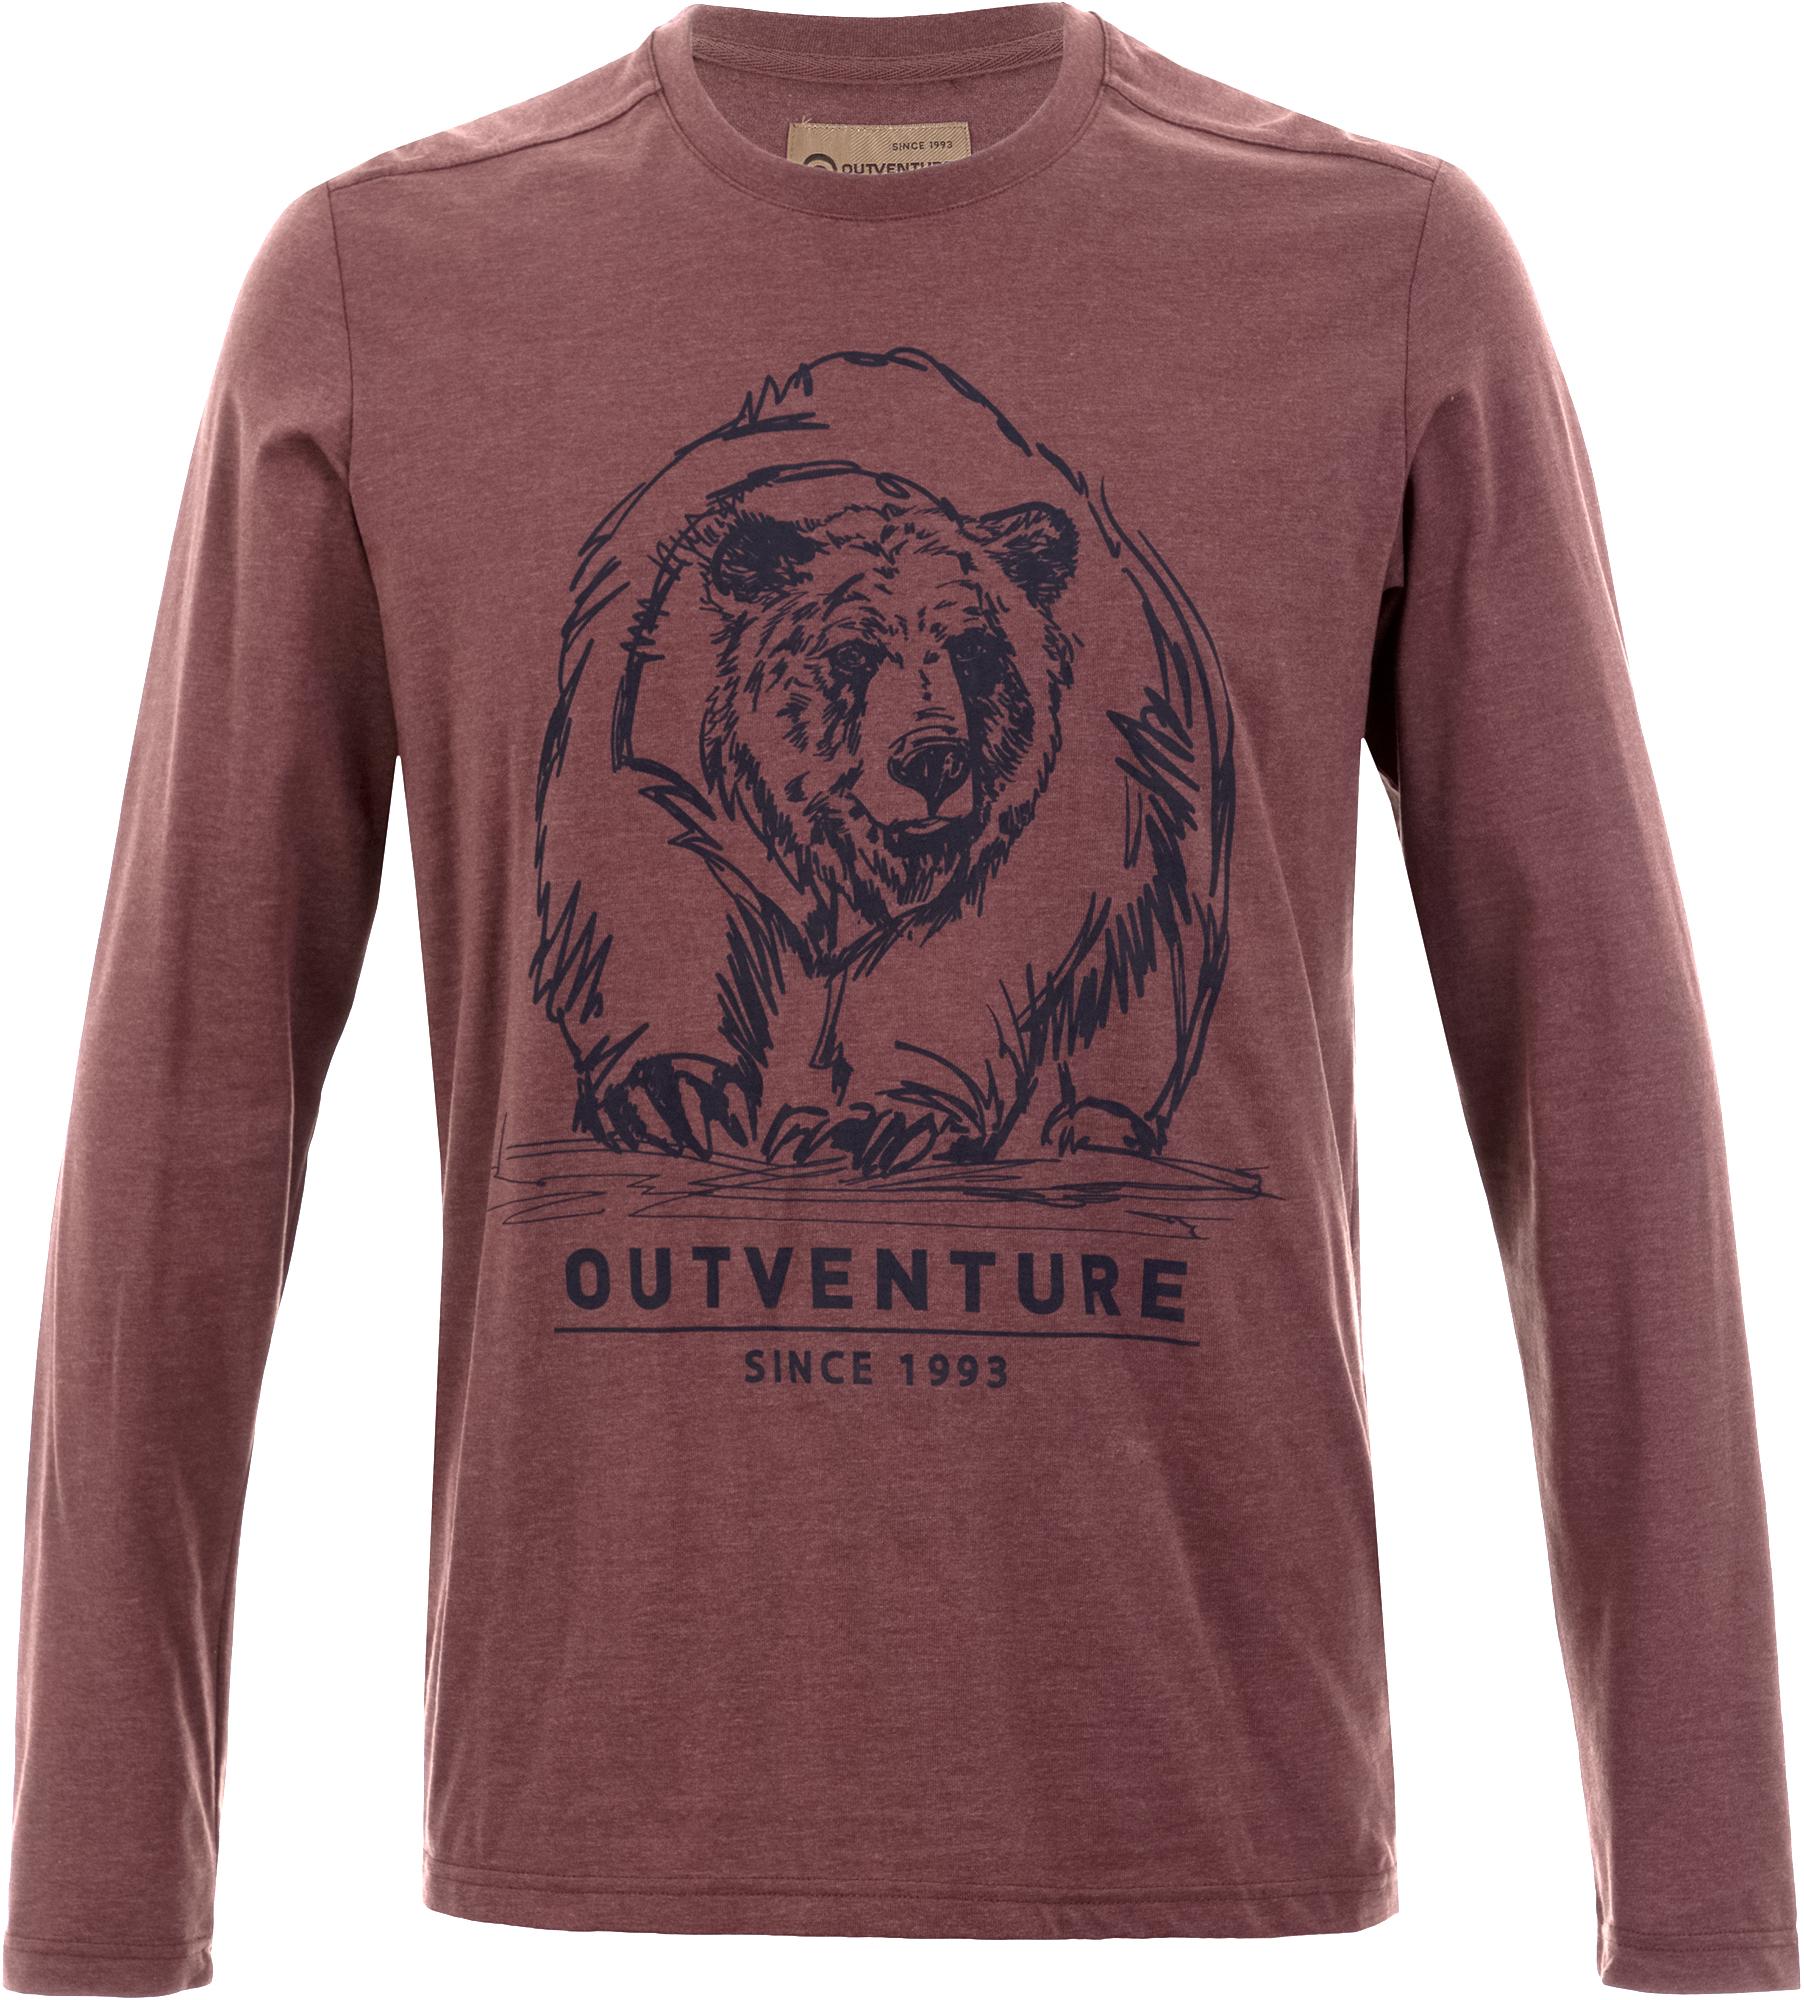 цена на Outventure Лонгслив мужской Outventure, размер 58